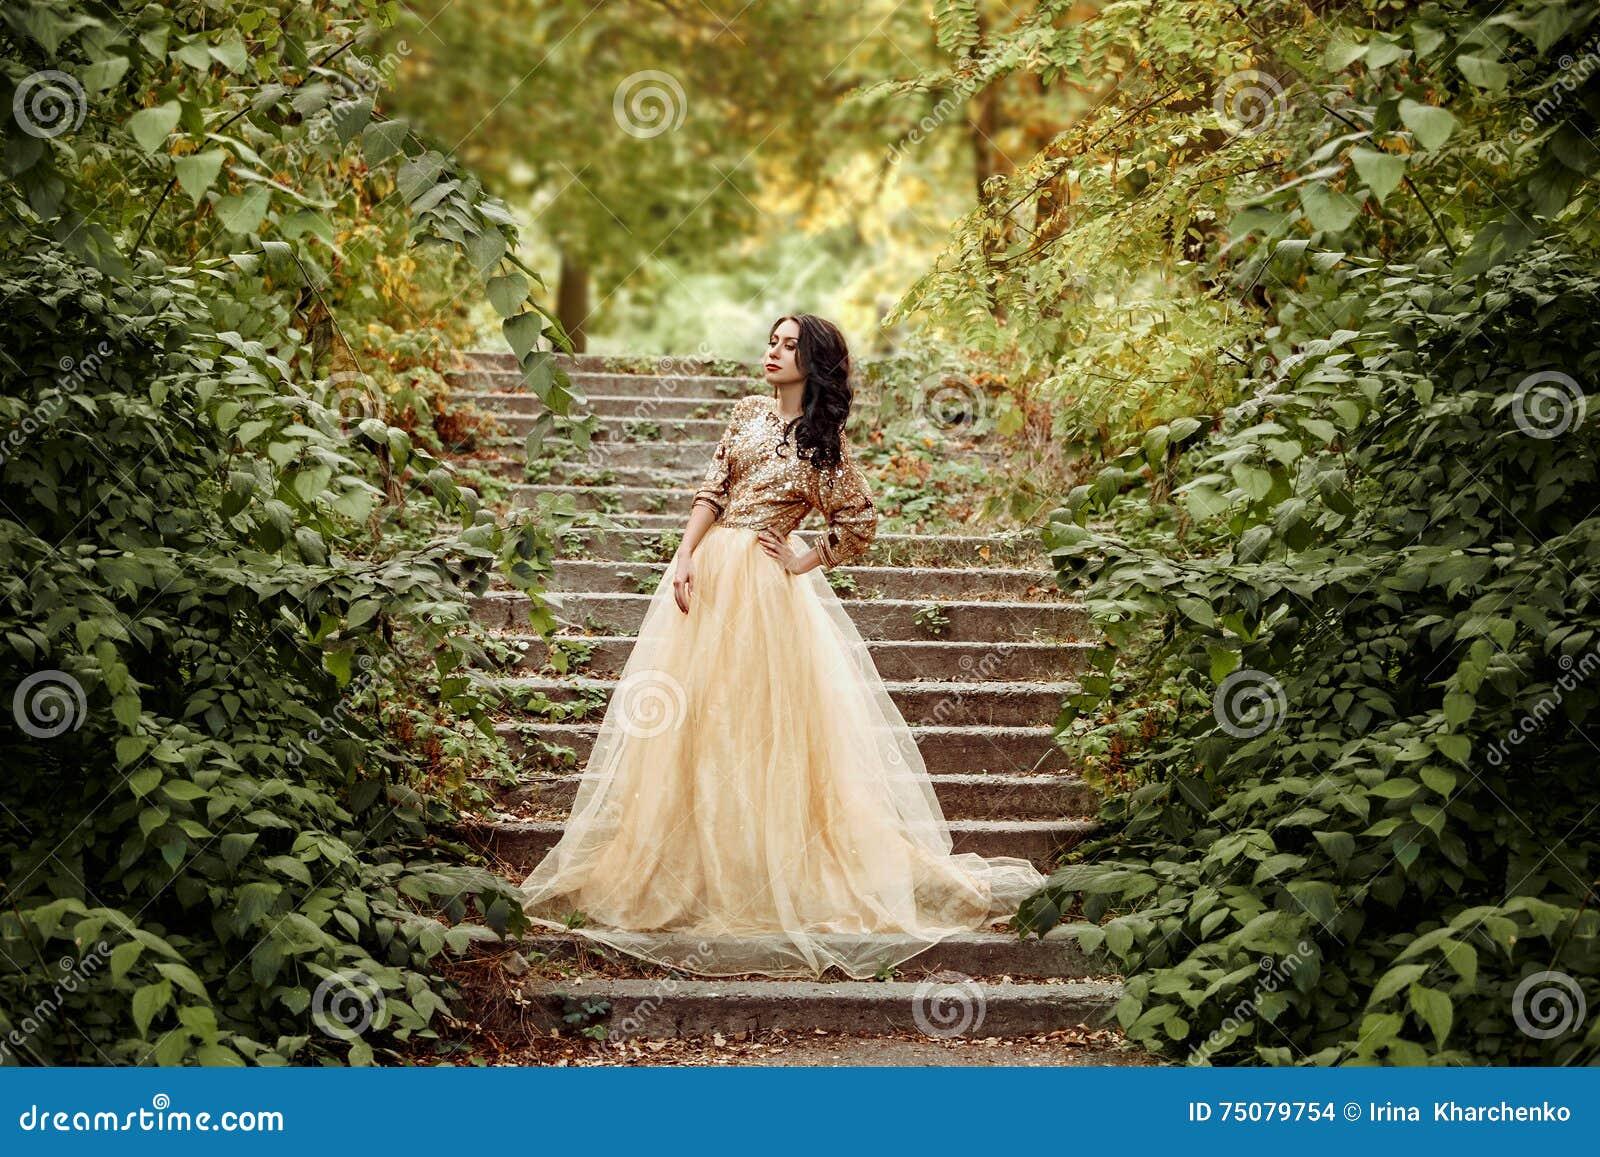 Mooi meisje in een gouden, luxueuze kleding